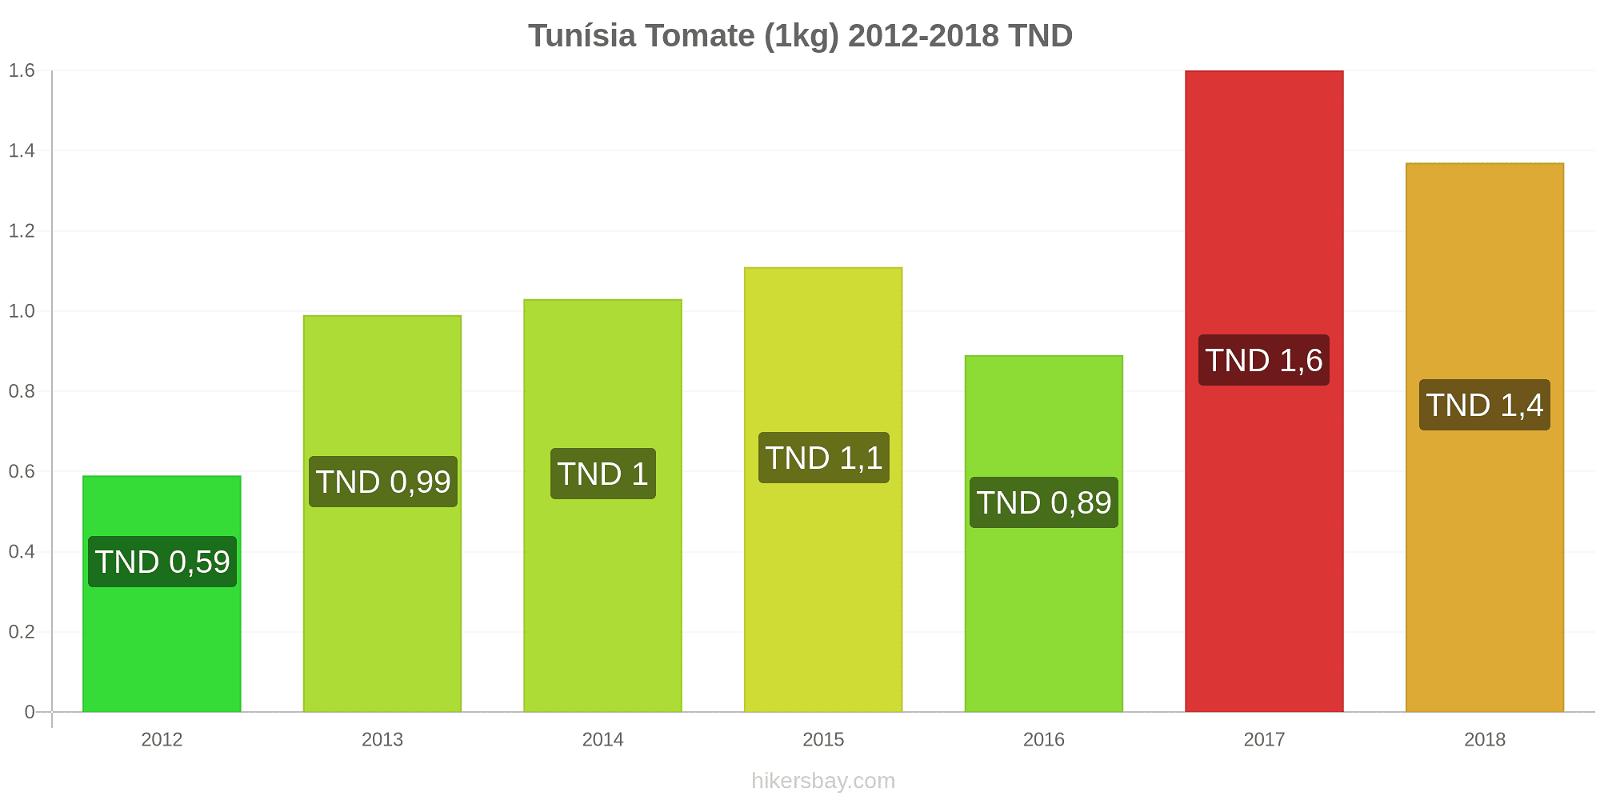 Tunísia variação de preço Tomate (1kg) hikersbay.com